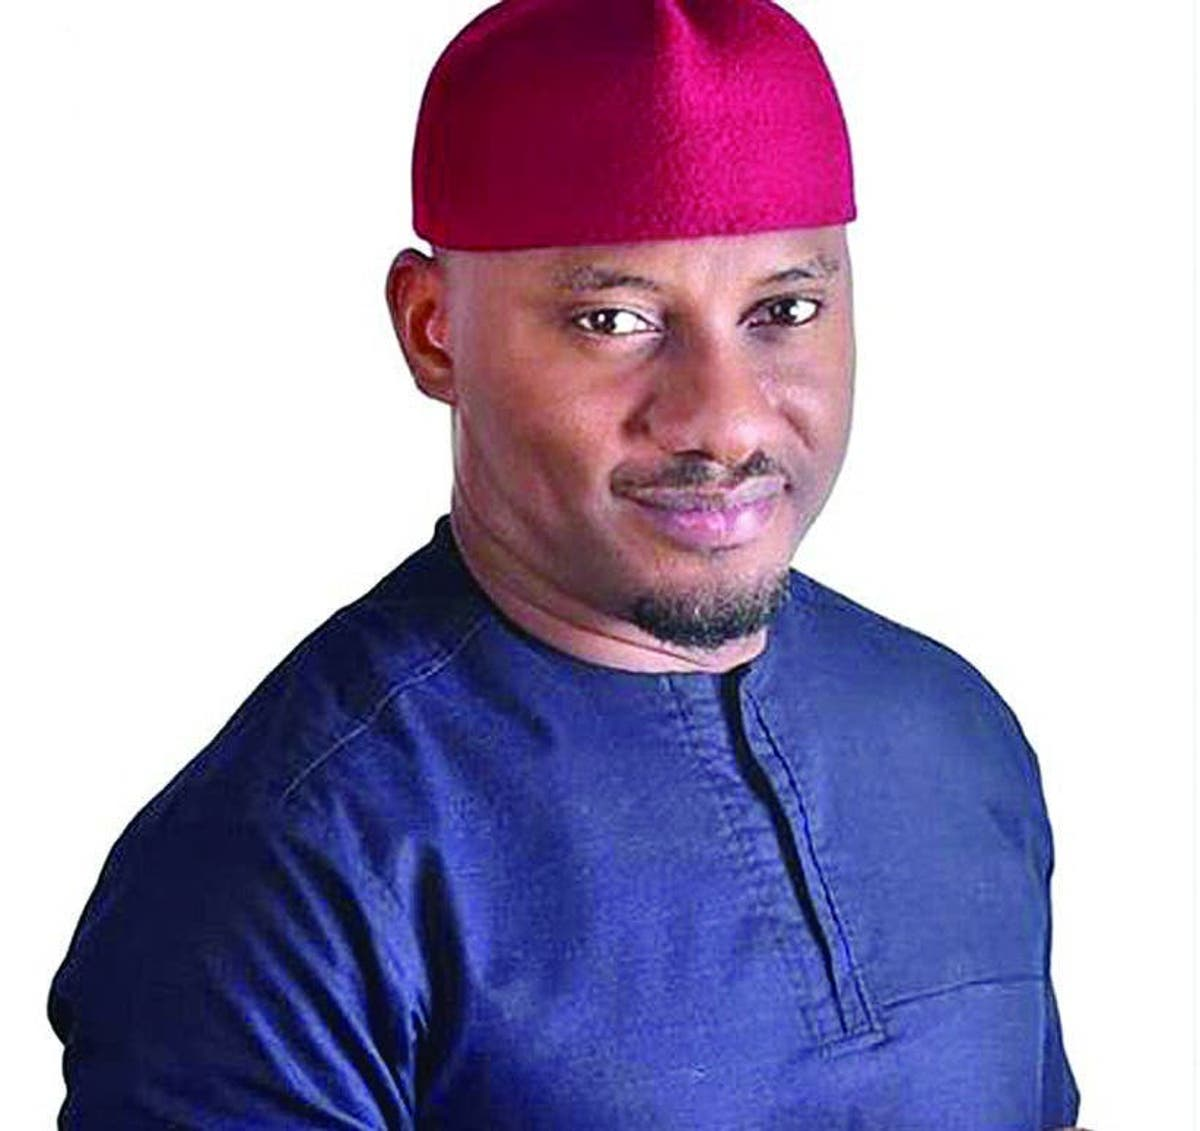 BBNaija: They provided content, leave them alone – Yul Edochie slams Tega, Boma critics